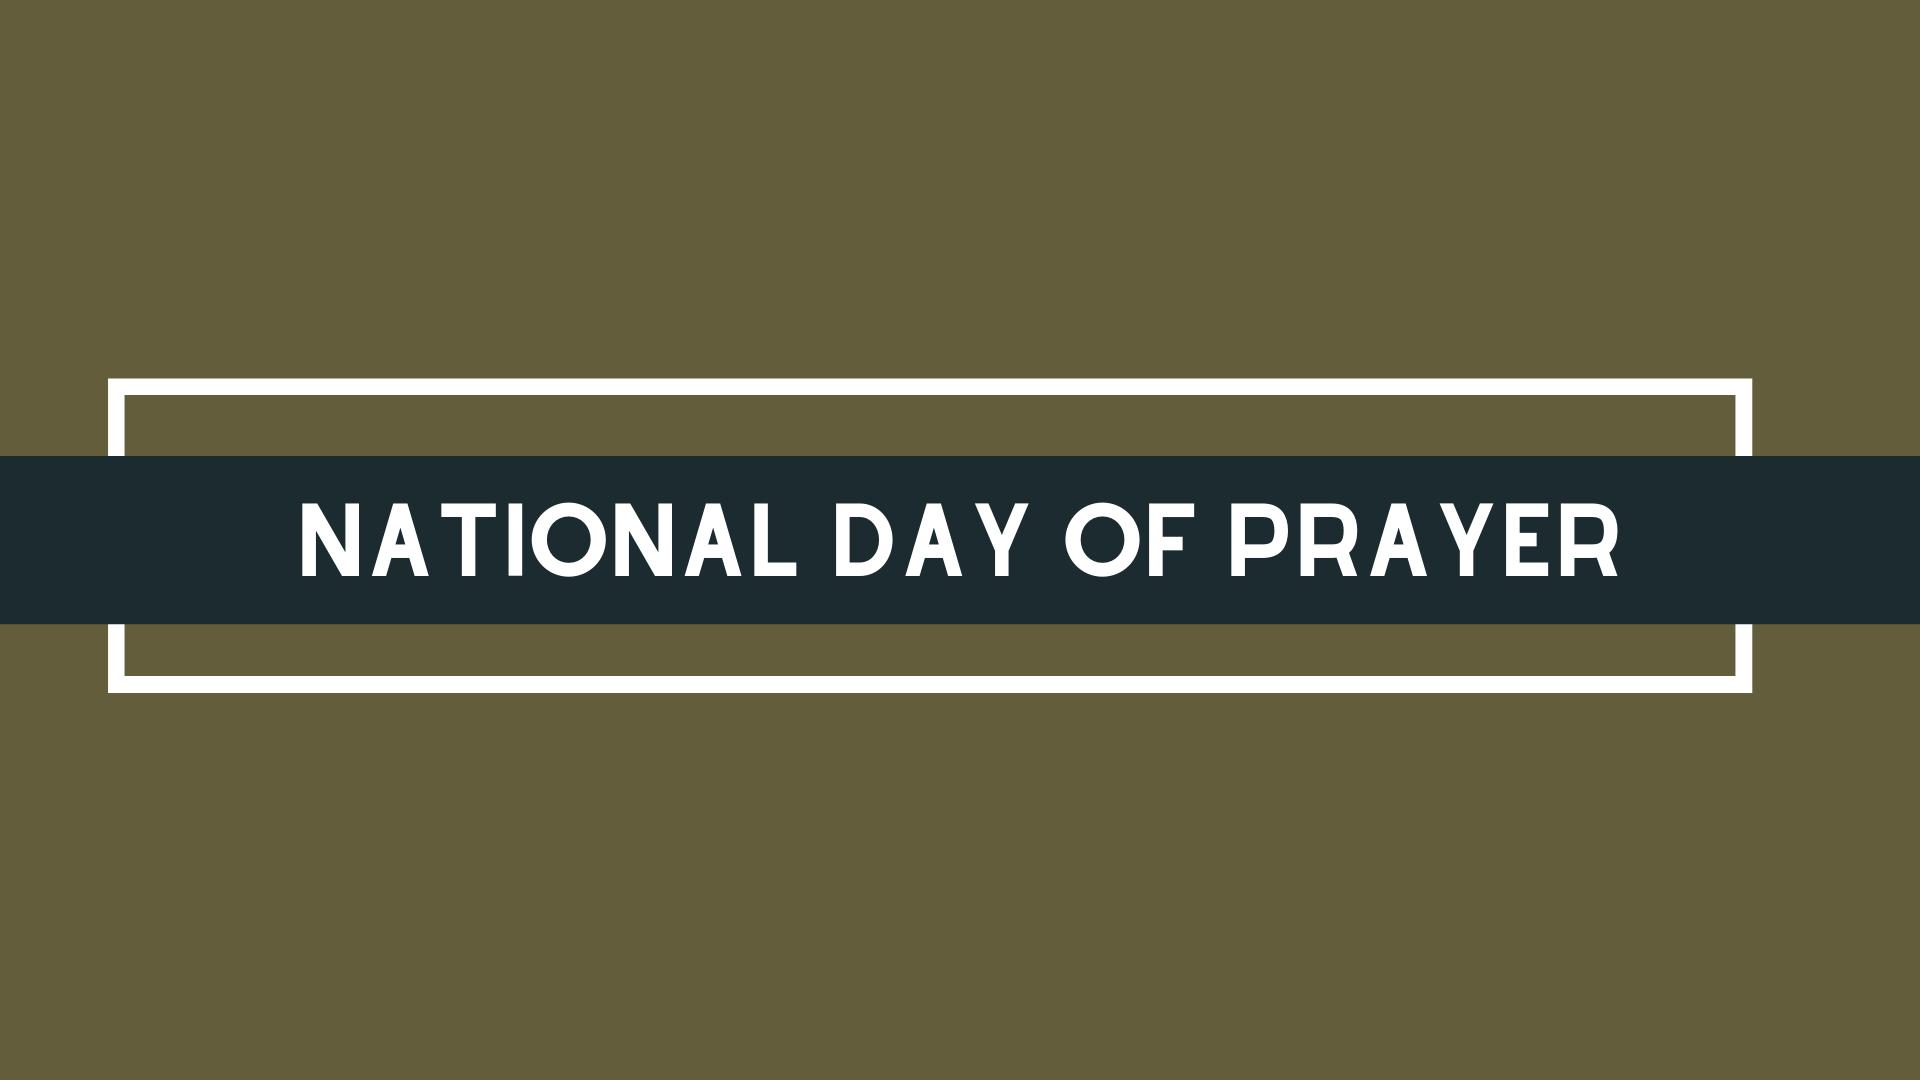 National Day of Prayer 3/15/2020